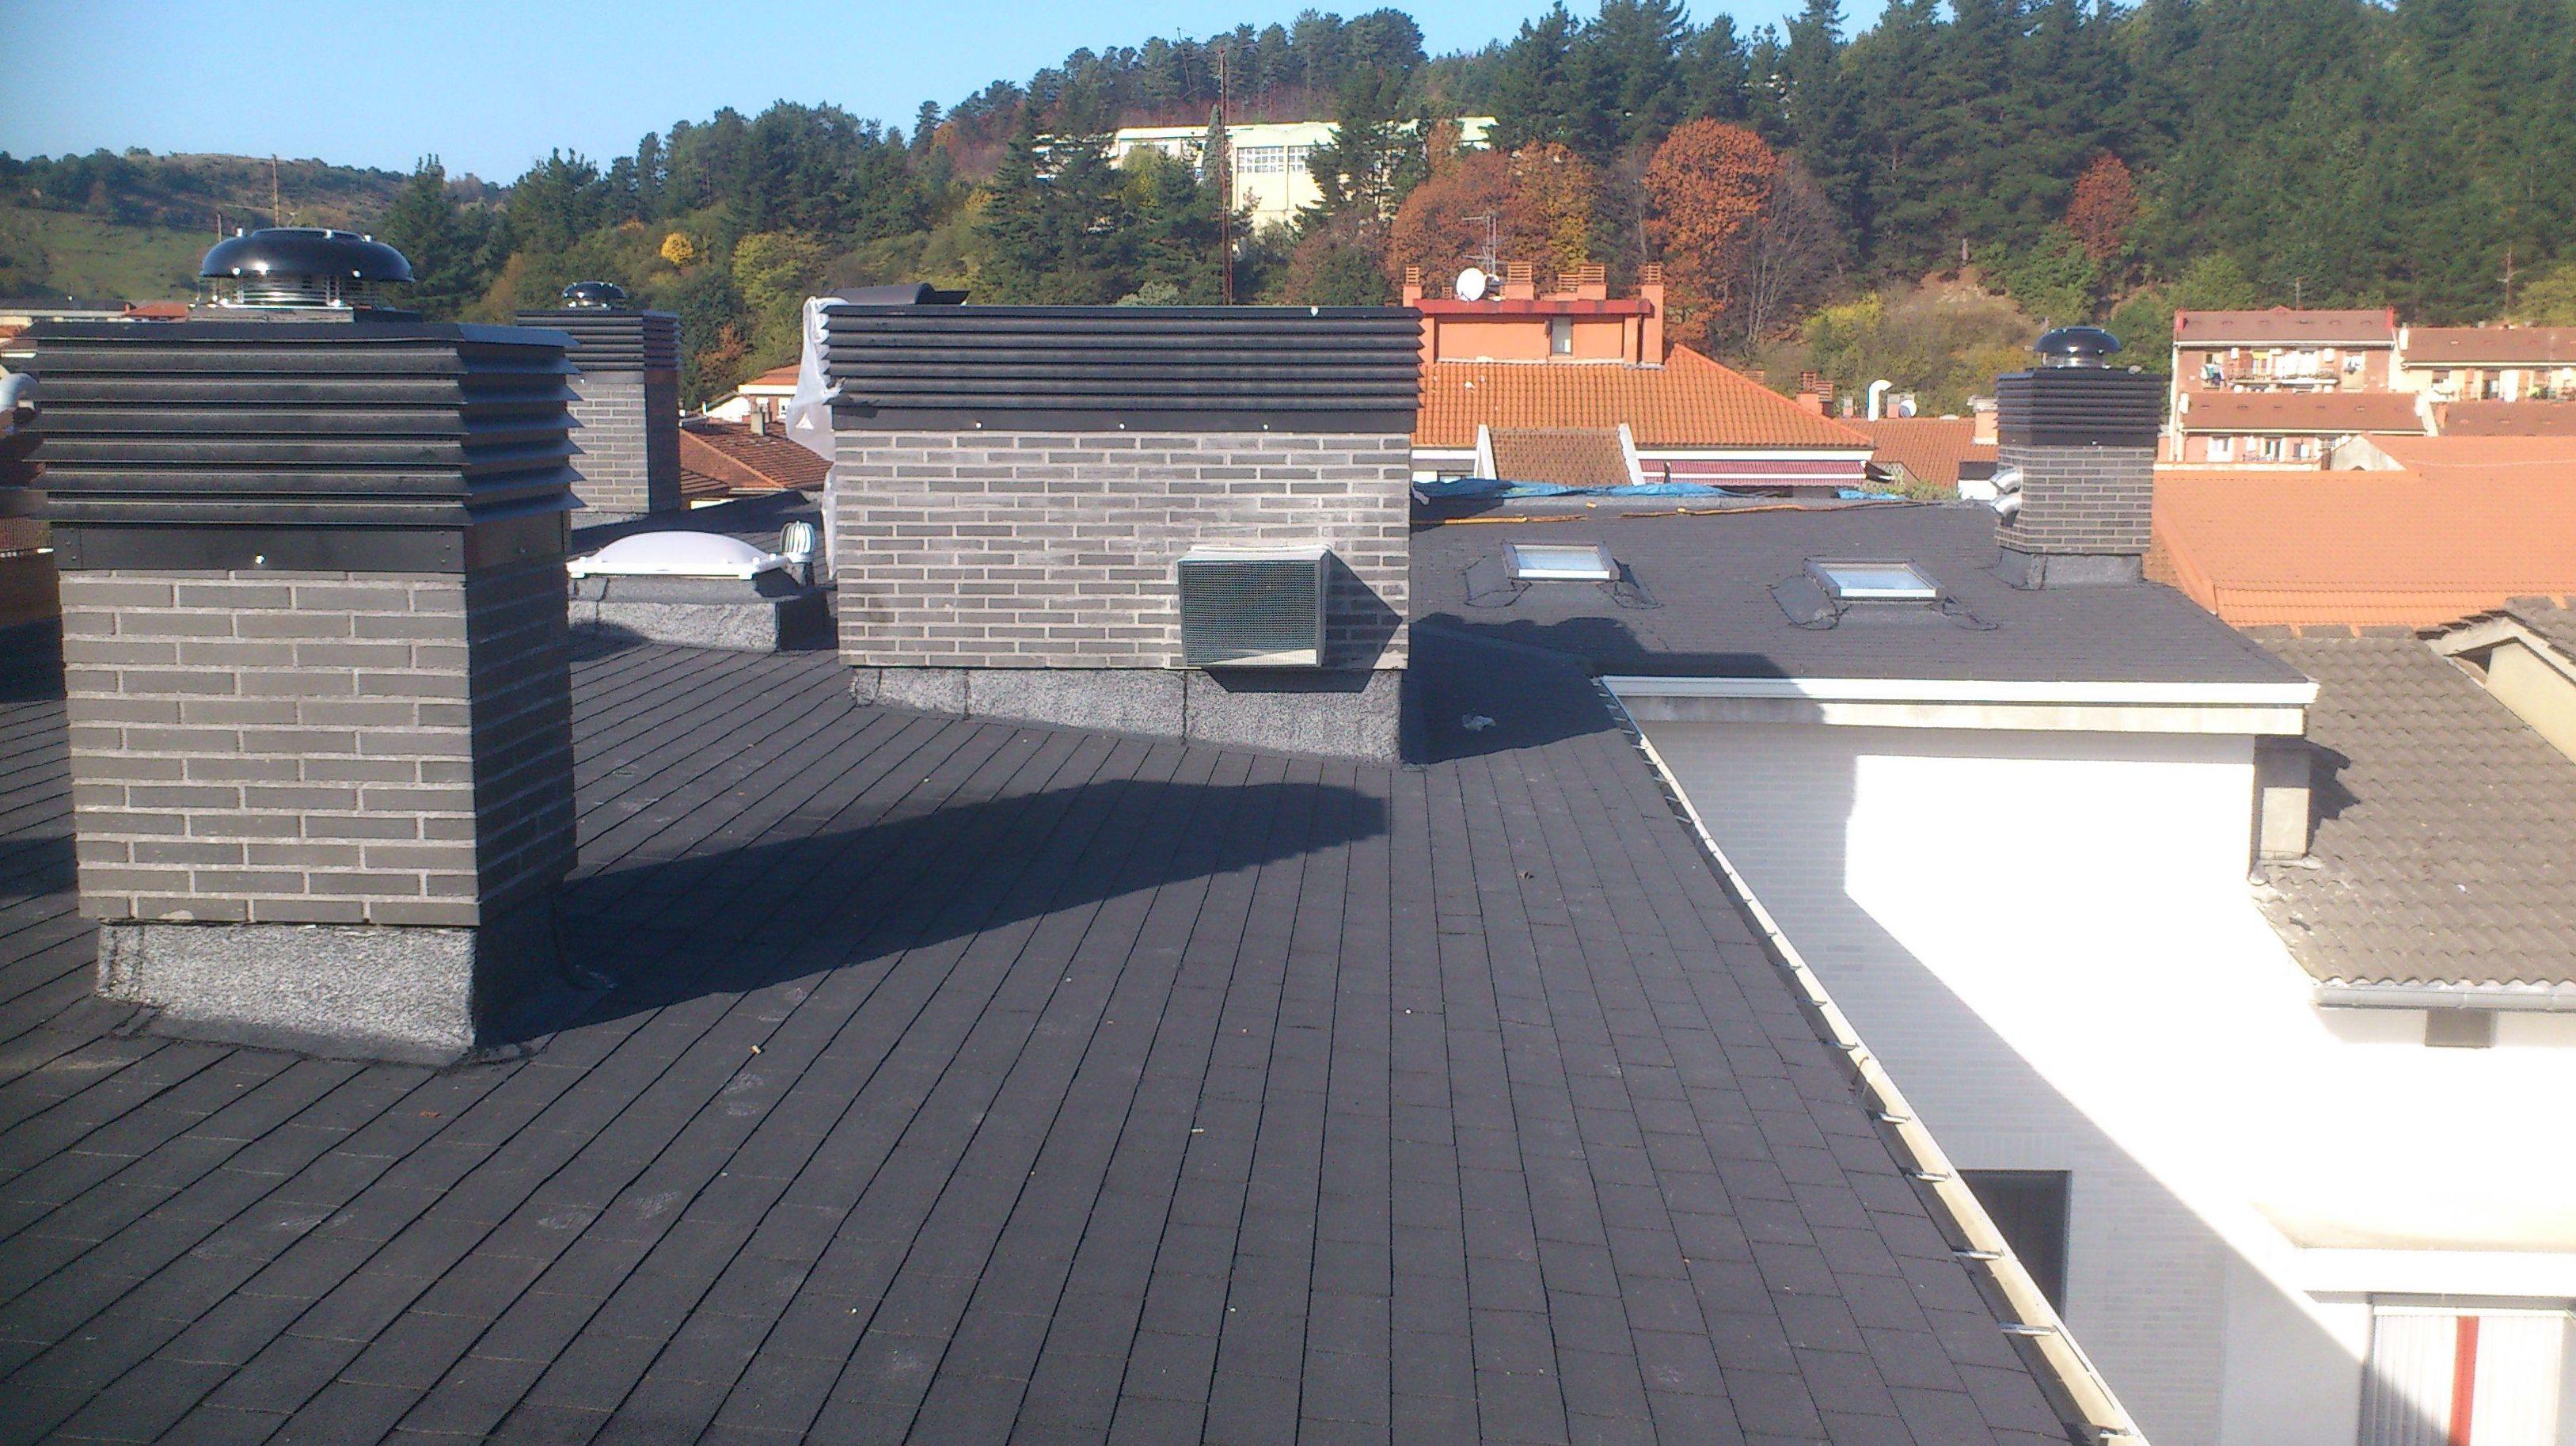 Foto 5 de impermeabilizaci n en galdakao - Impermeabilizacion de tejados ...